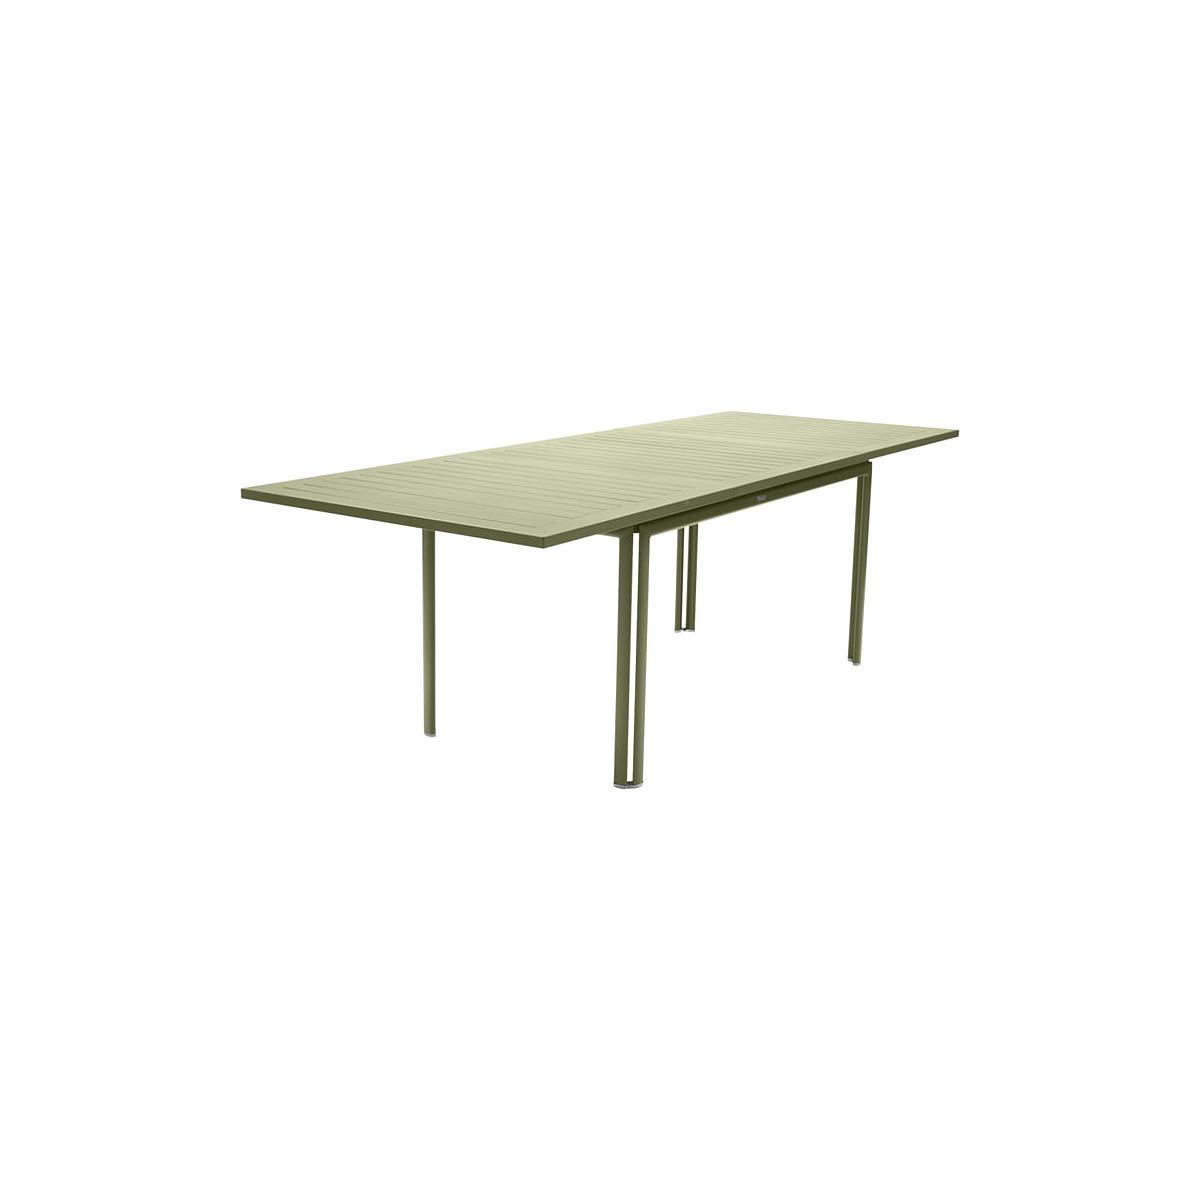 COSTA by Fermob table à allonge tilleul